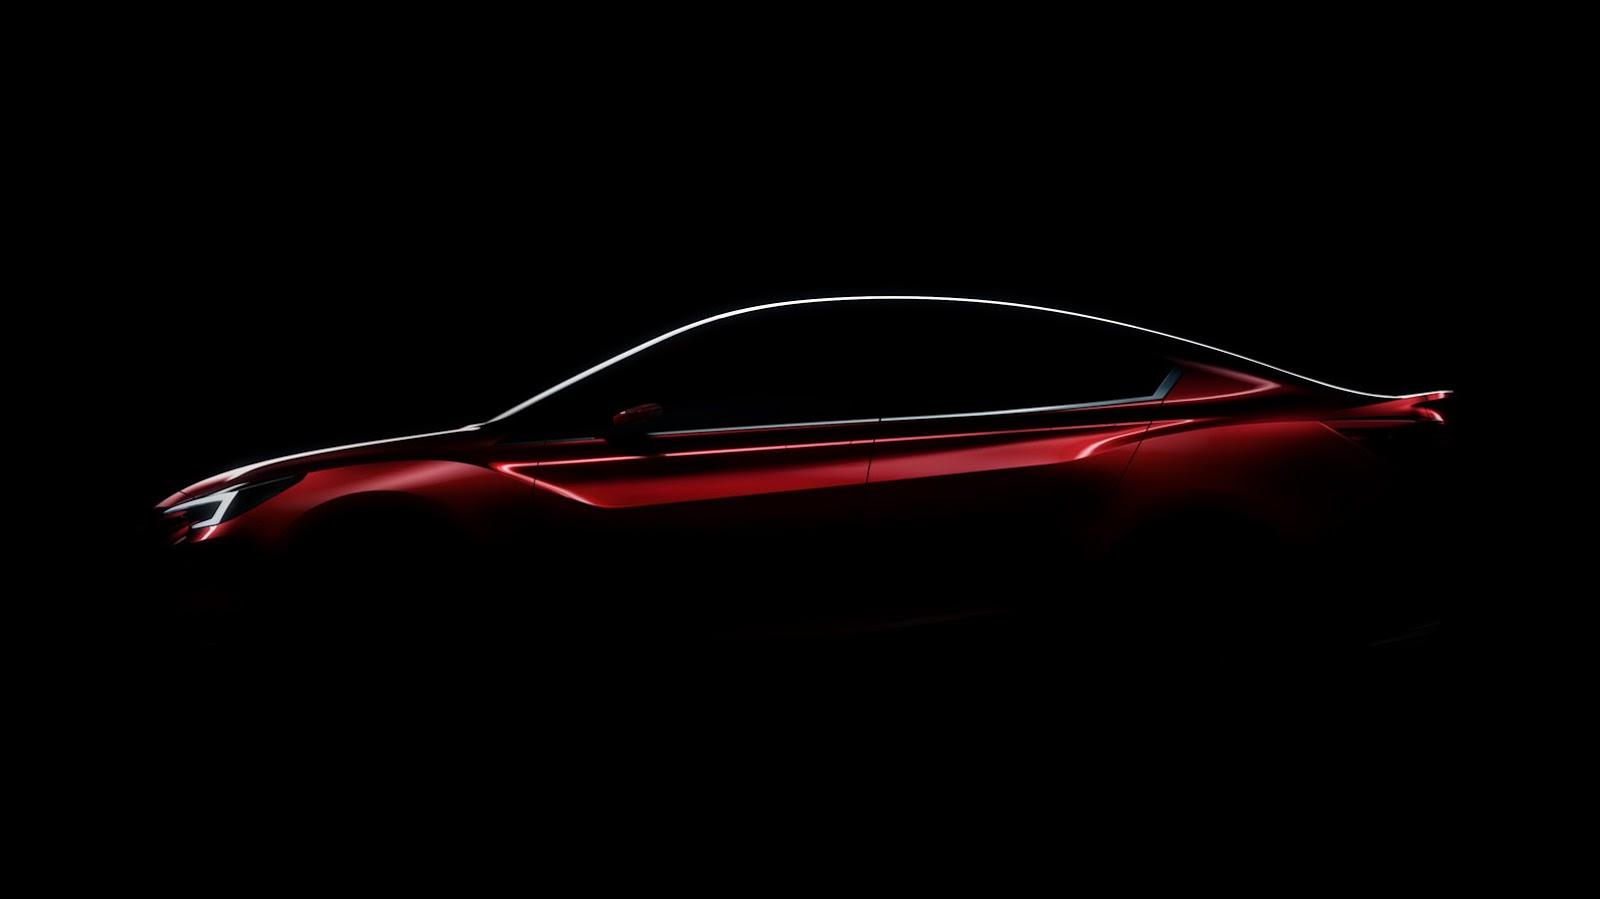 Subaru-Concept-Impreza-1